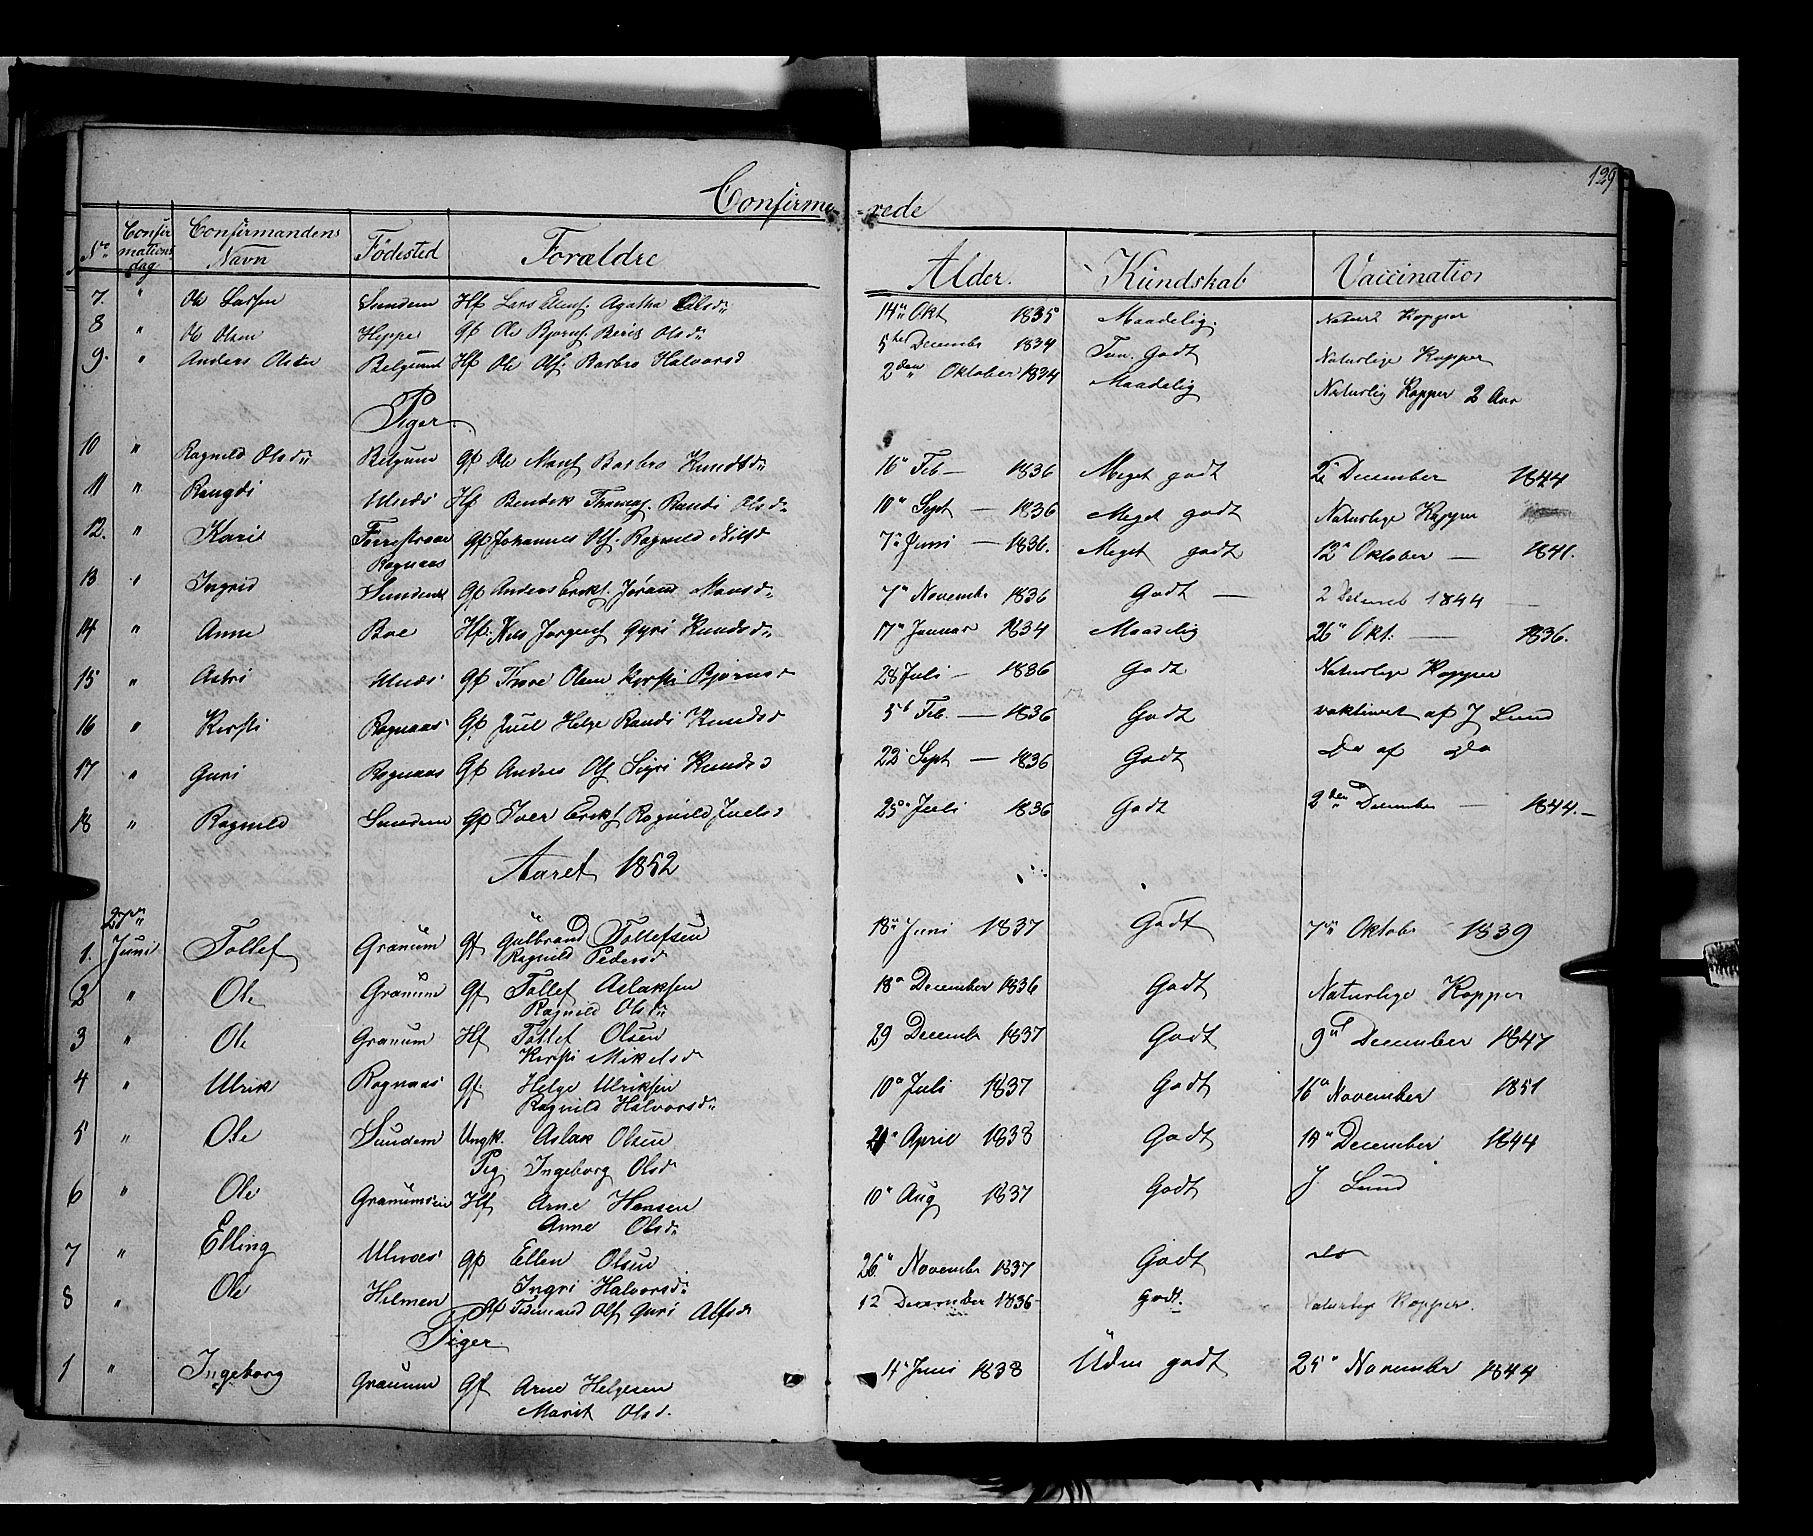 SAH, Nord-Aurdal prestekontor, Ministerialbok nr. 6, 1842-1863, s. 129